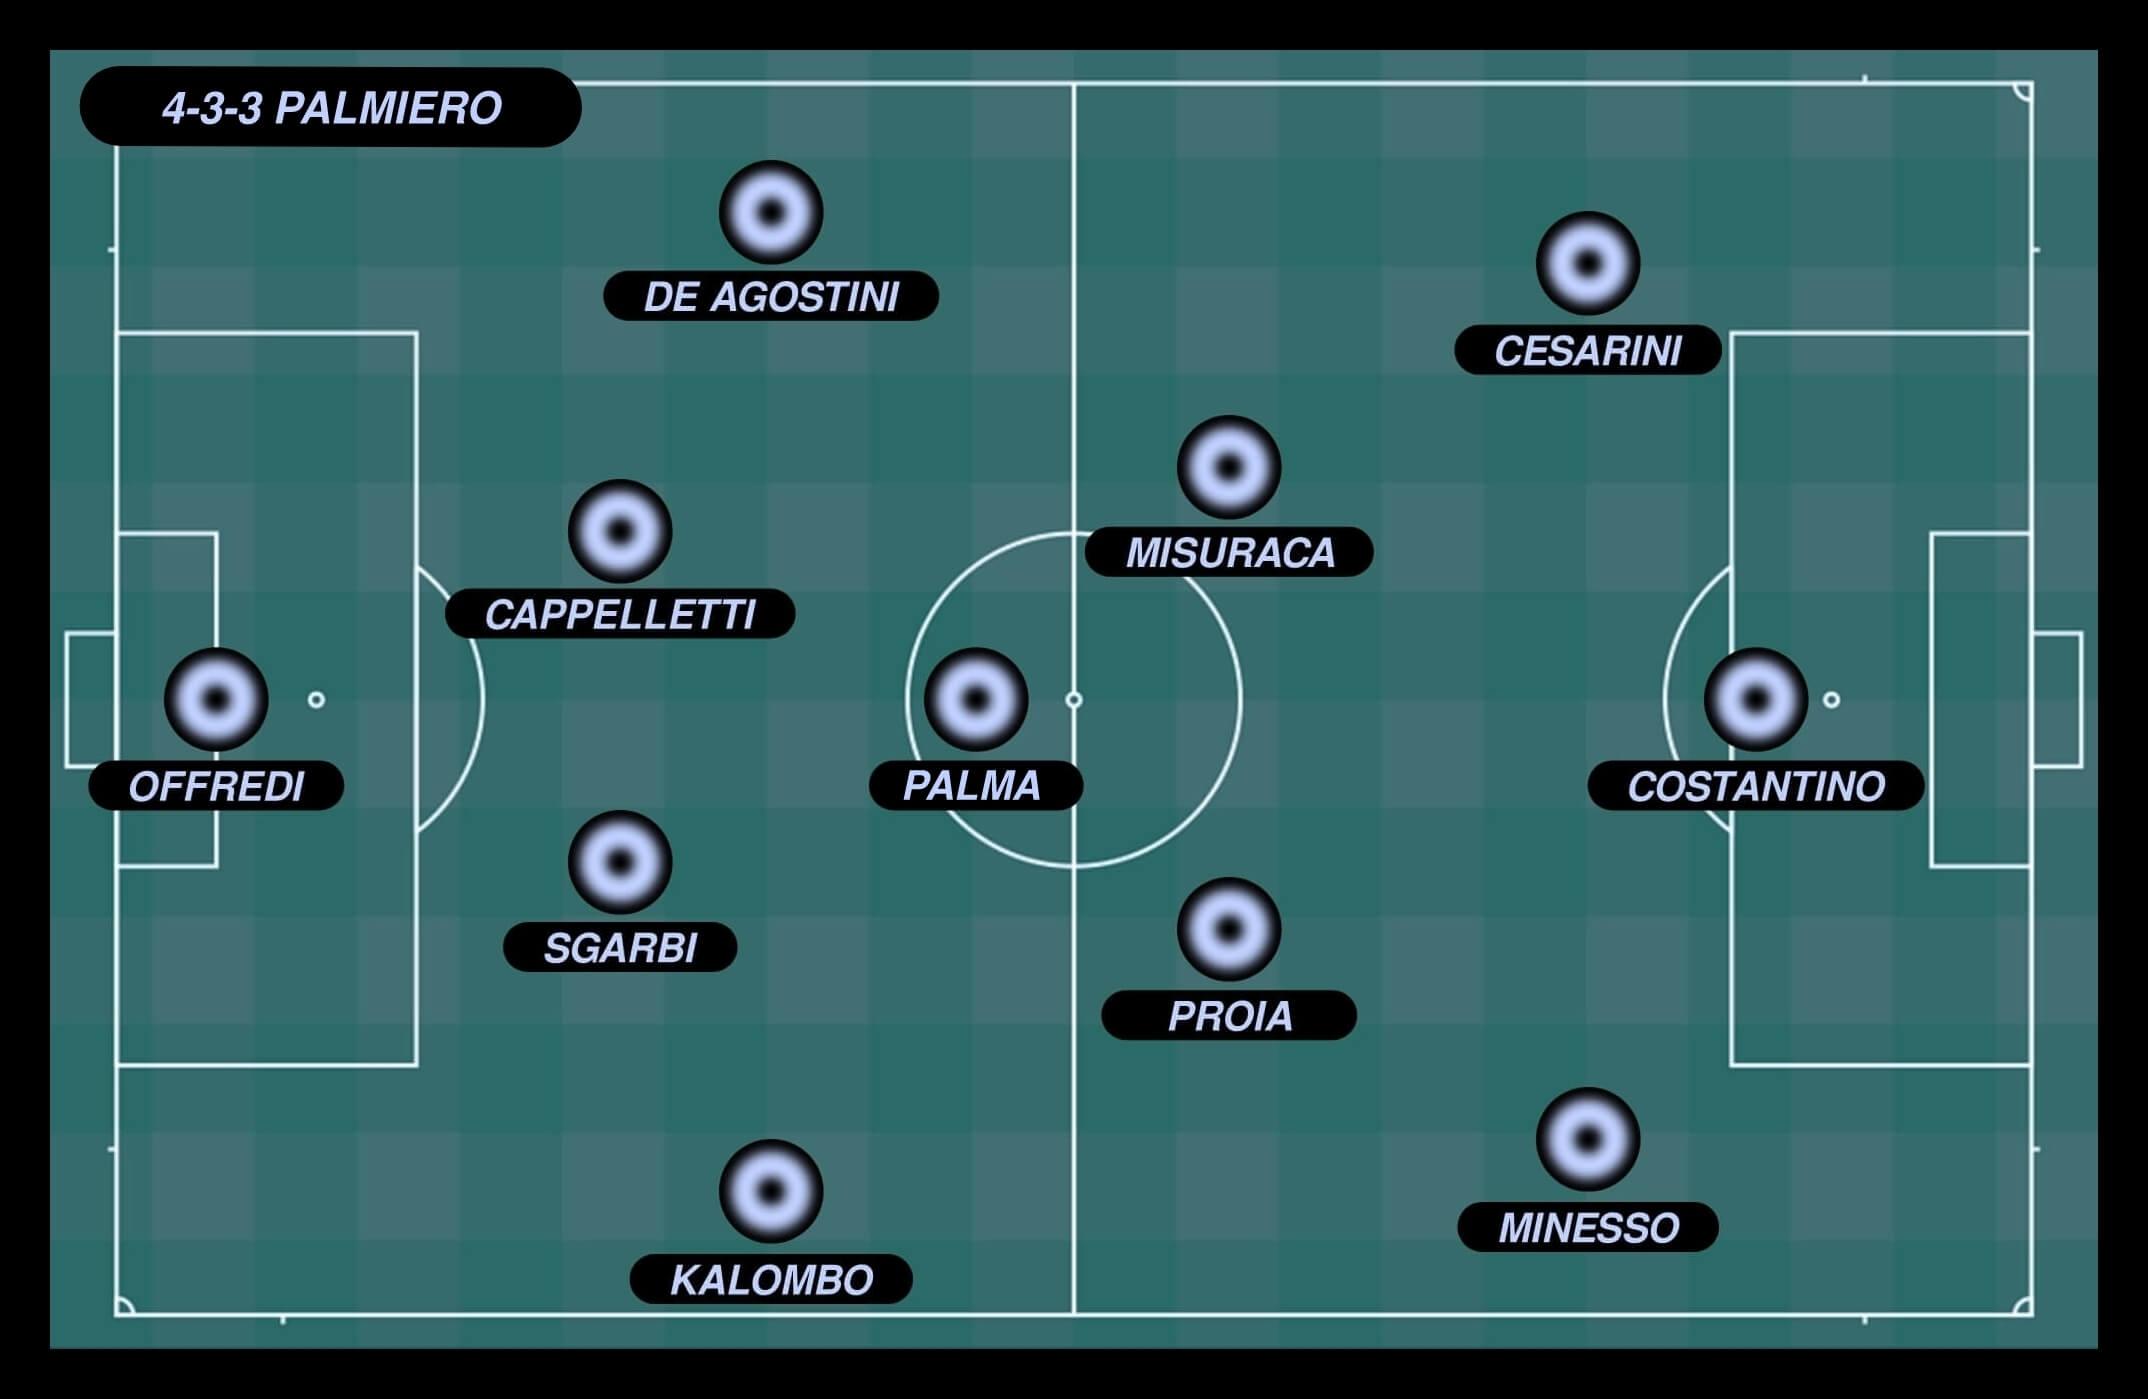 Top XI Palmiero